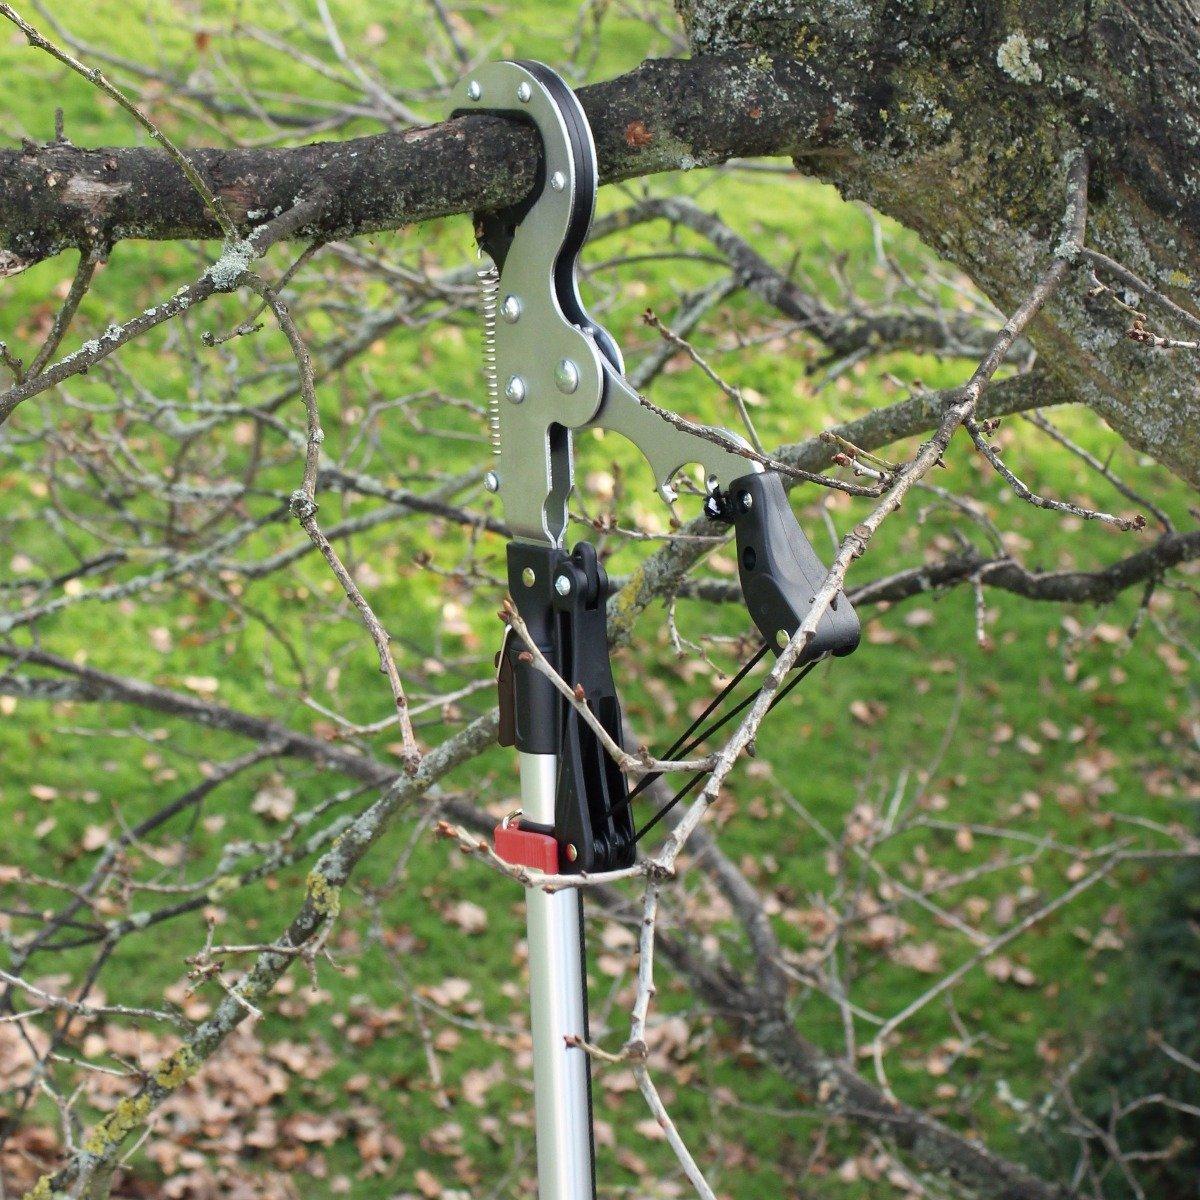 Darlac Swop Top Geared Tree Pruner Head Minimal Effort Geared Pulley